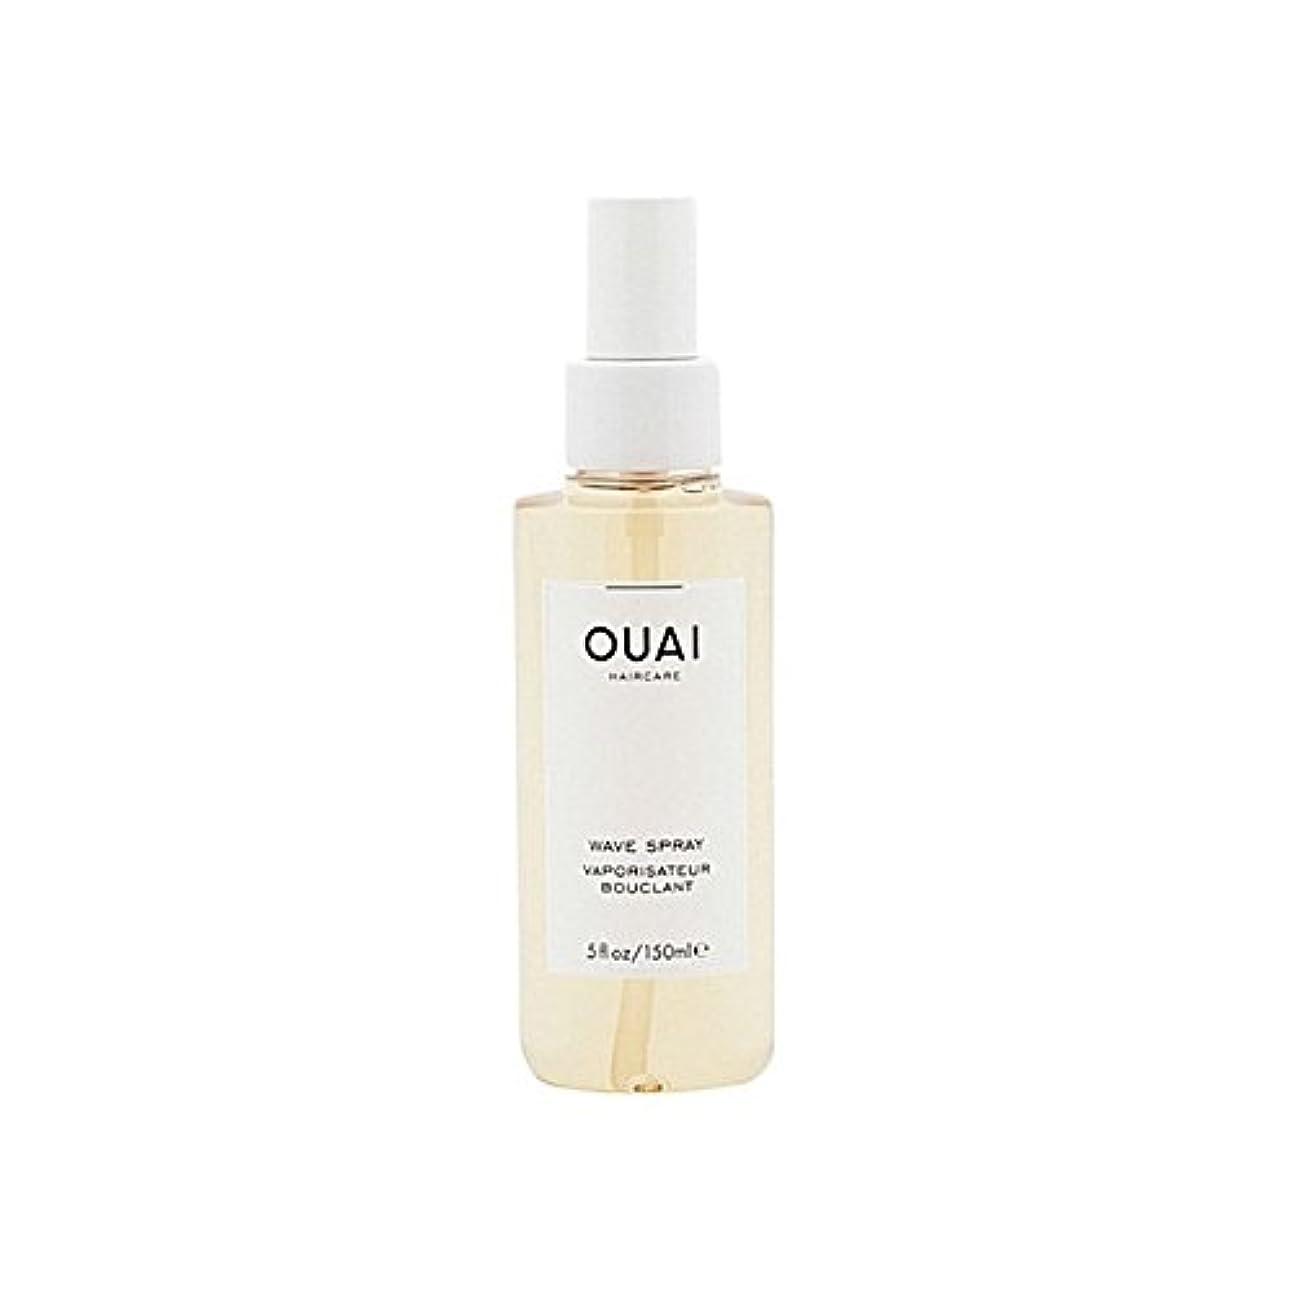 Ouai Wave Spray 148ml - 波スプレー148ミリリットル [並行輸入品]